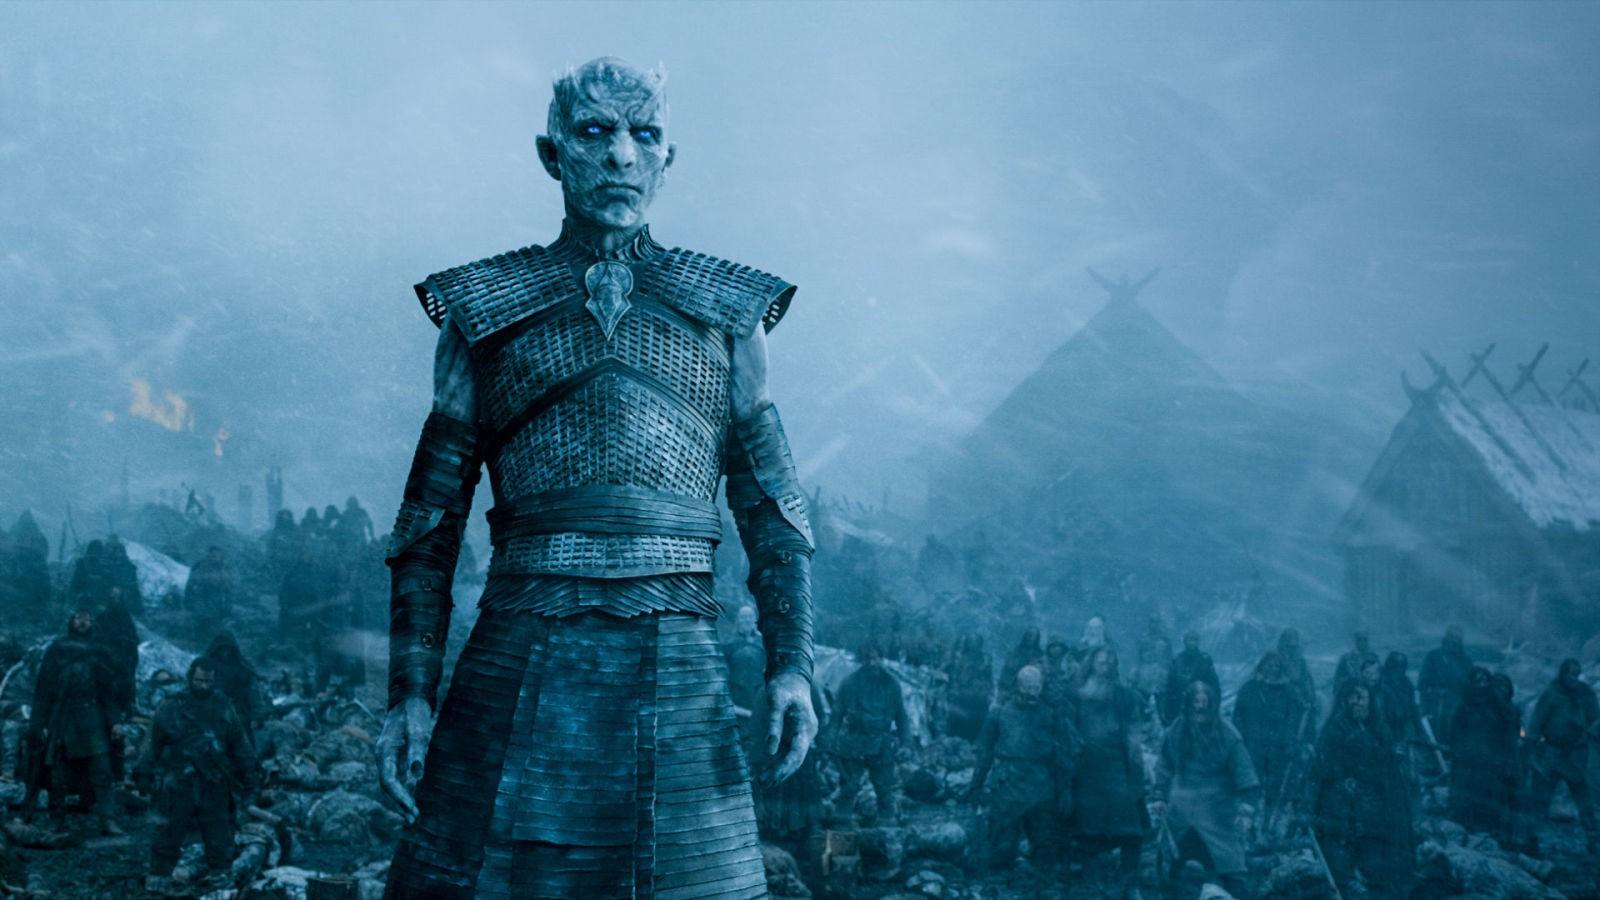 Watch Game Of Thrones Season 7 Online